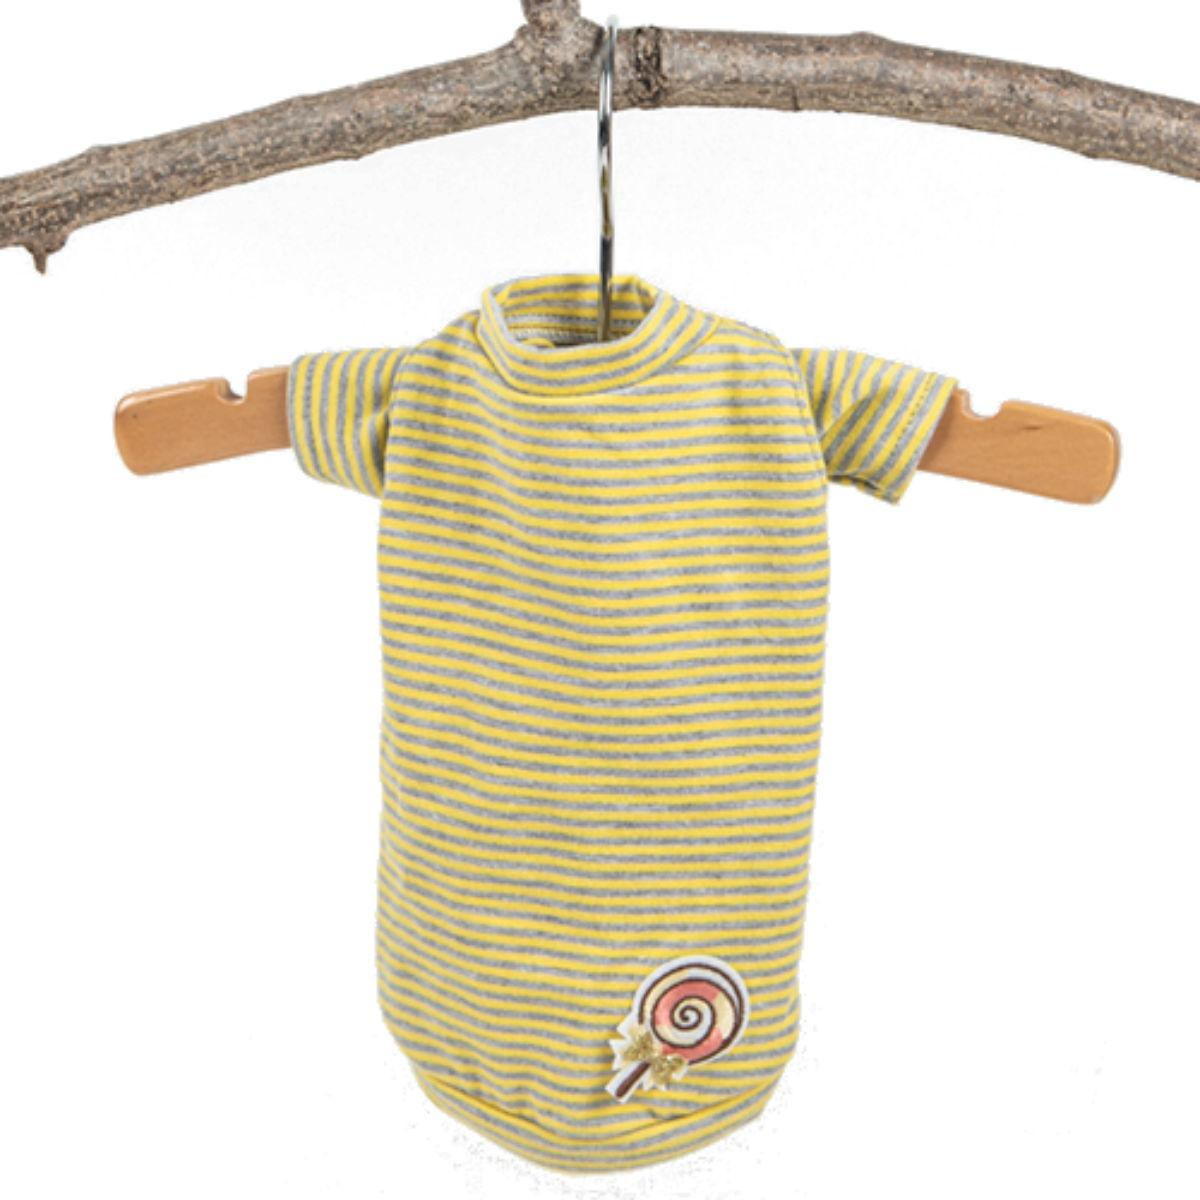 Hello Doggie Candy Striped Dog Shirt - Yellow